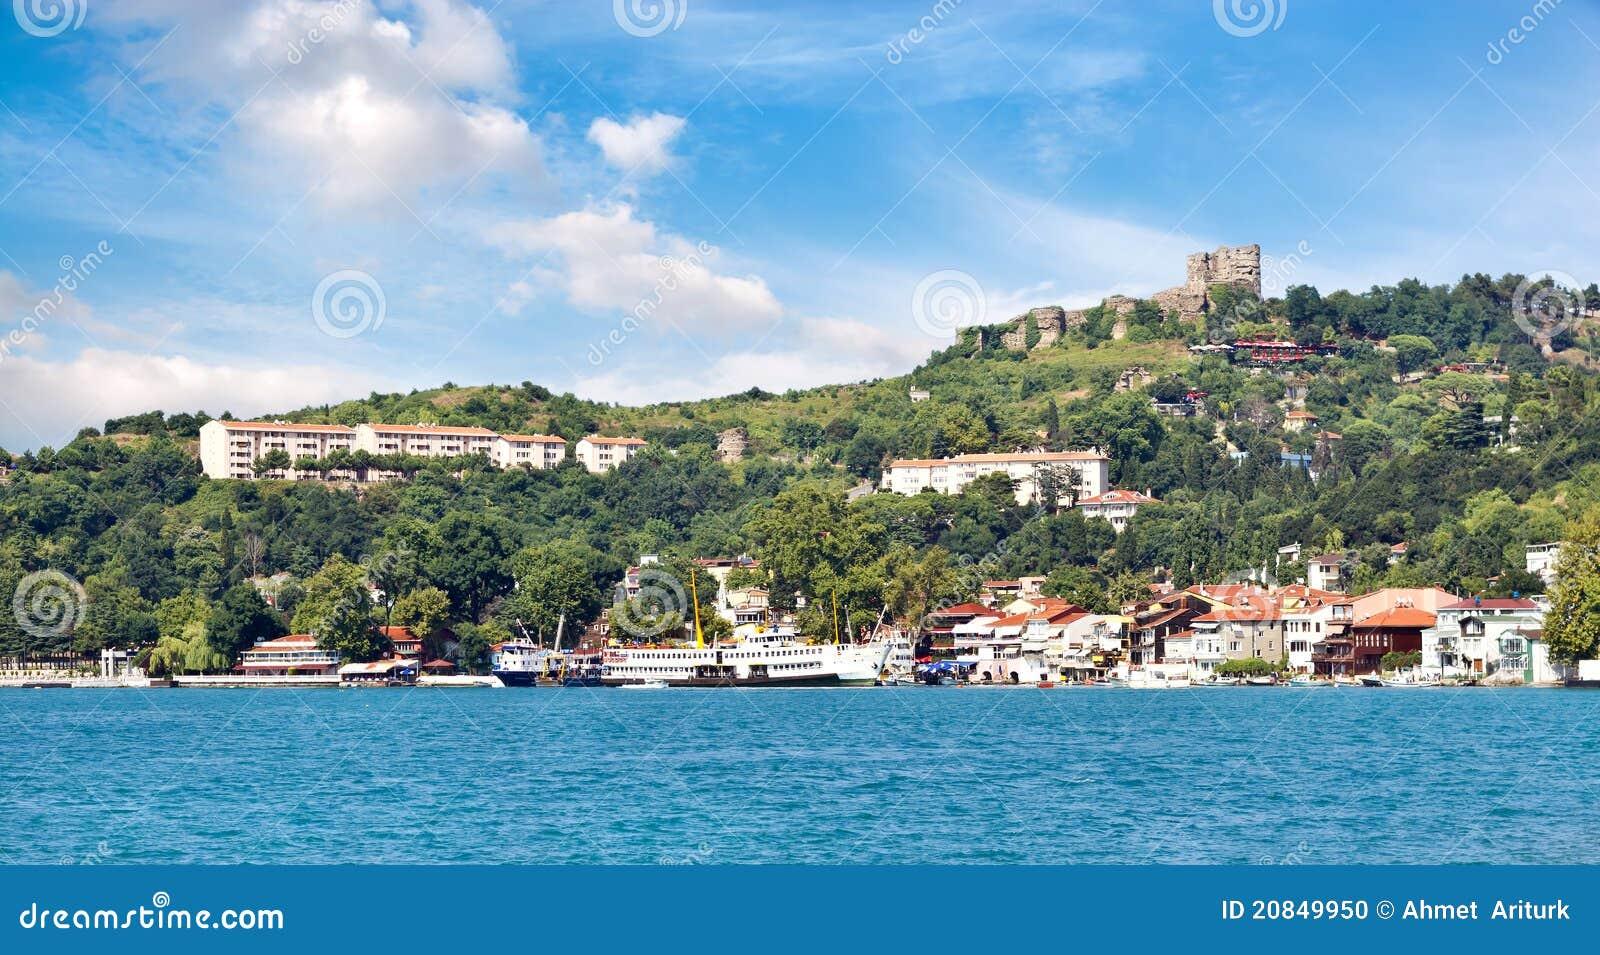 Anadolu Kavagi, Istanbul Stock Photo - Image: 20849950